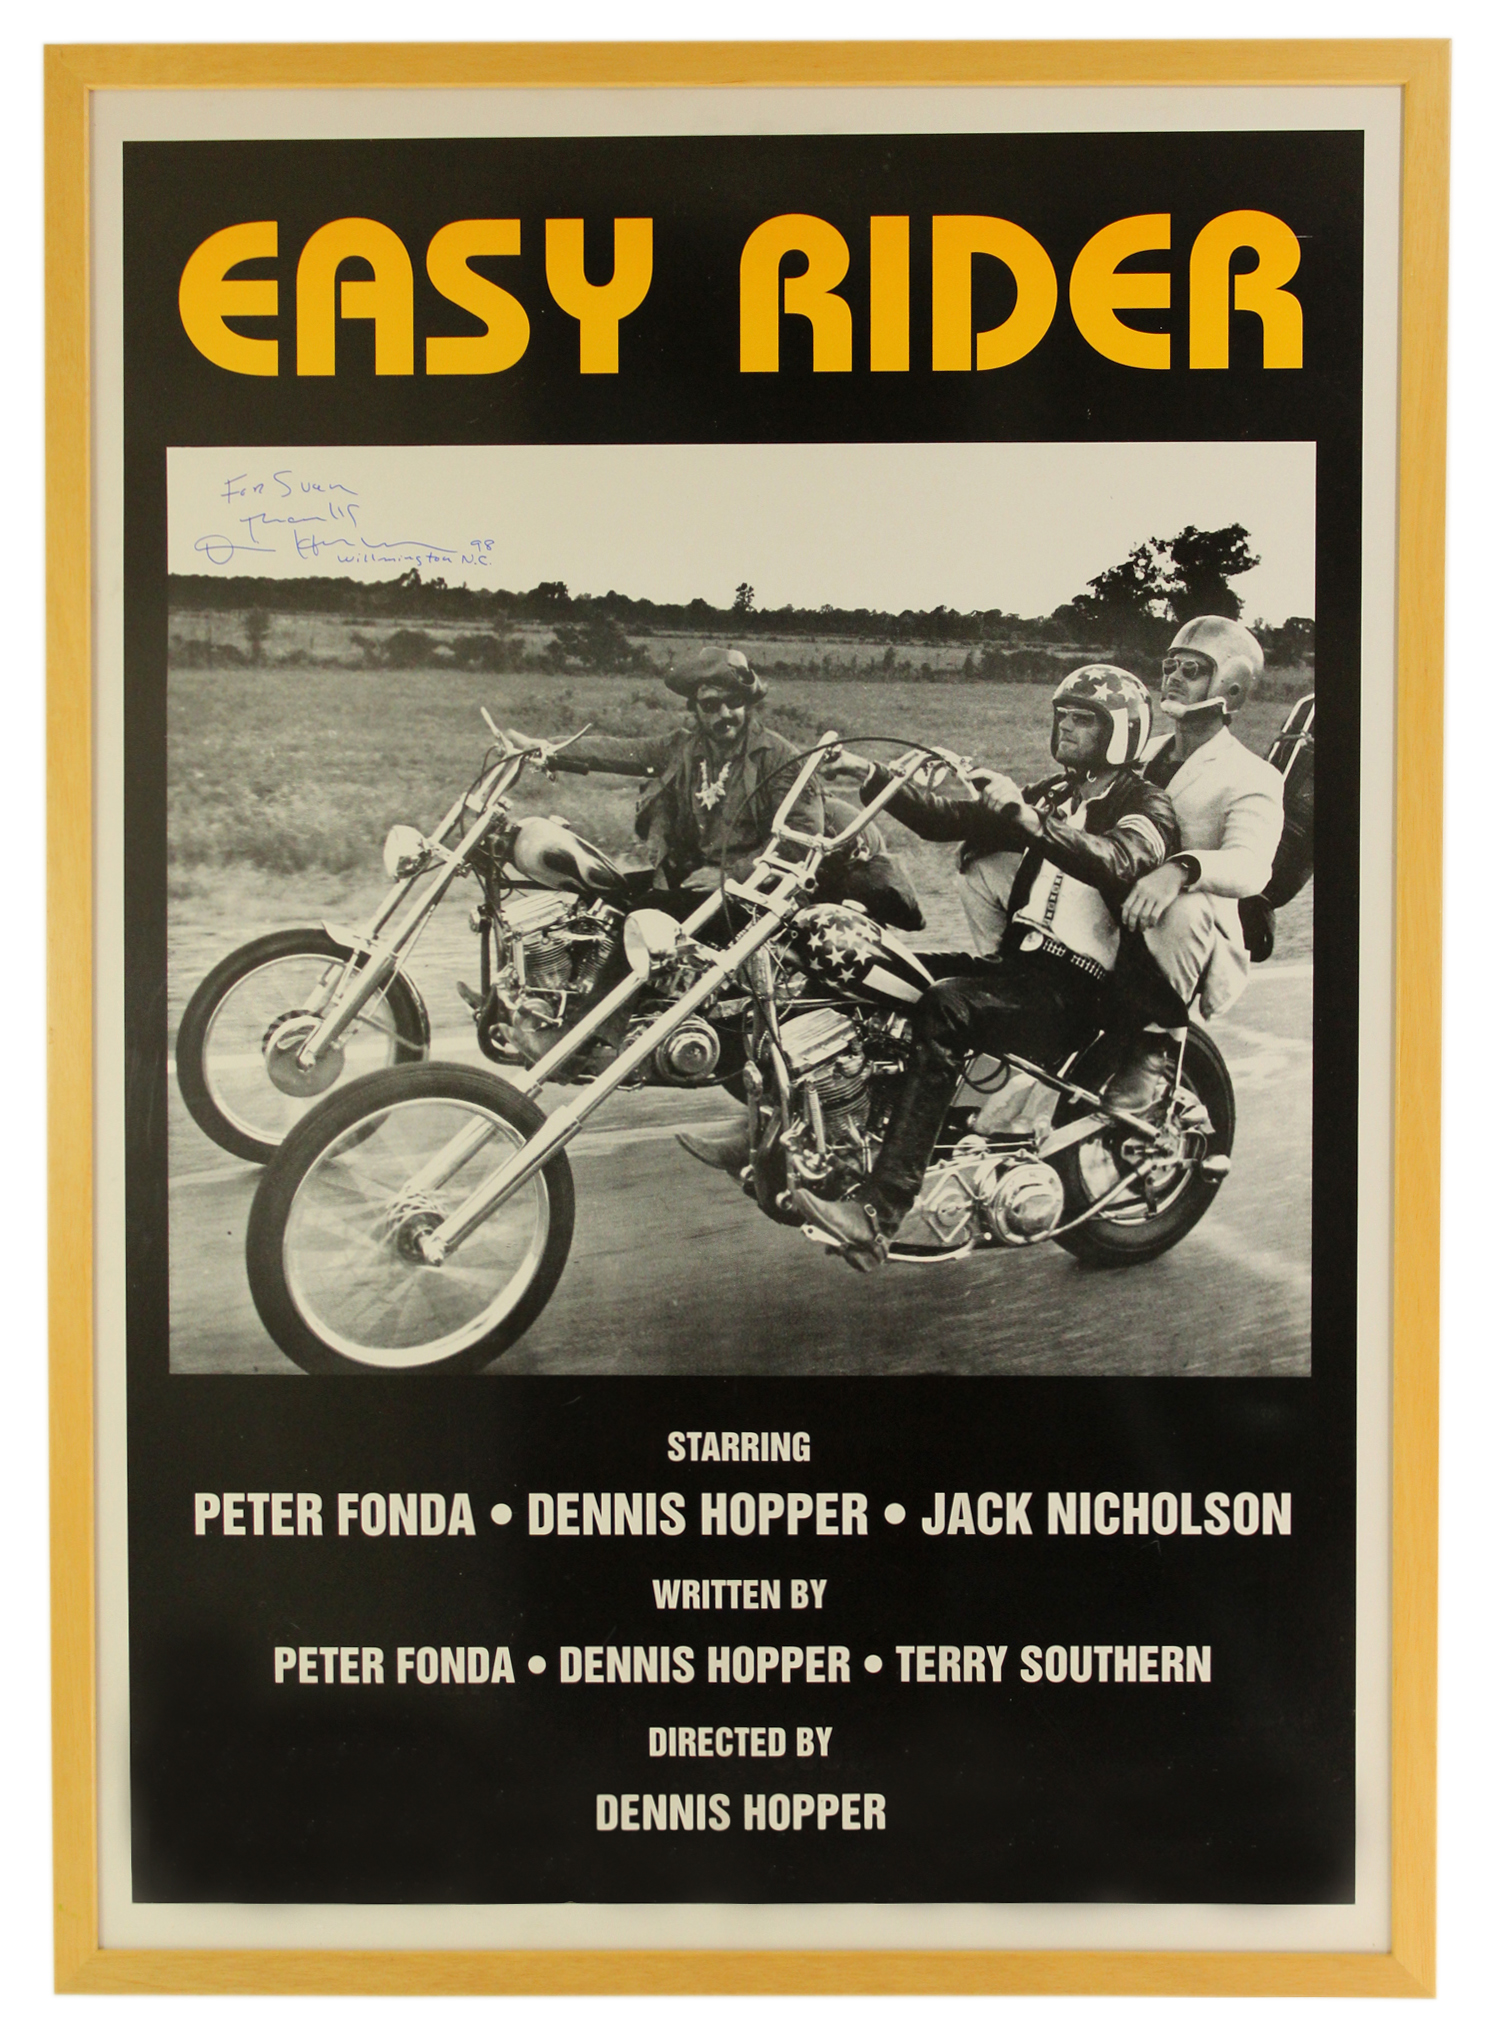 Dennis Hopper Signed Easy Rider Poster | Chairish